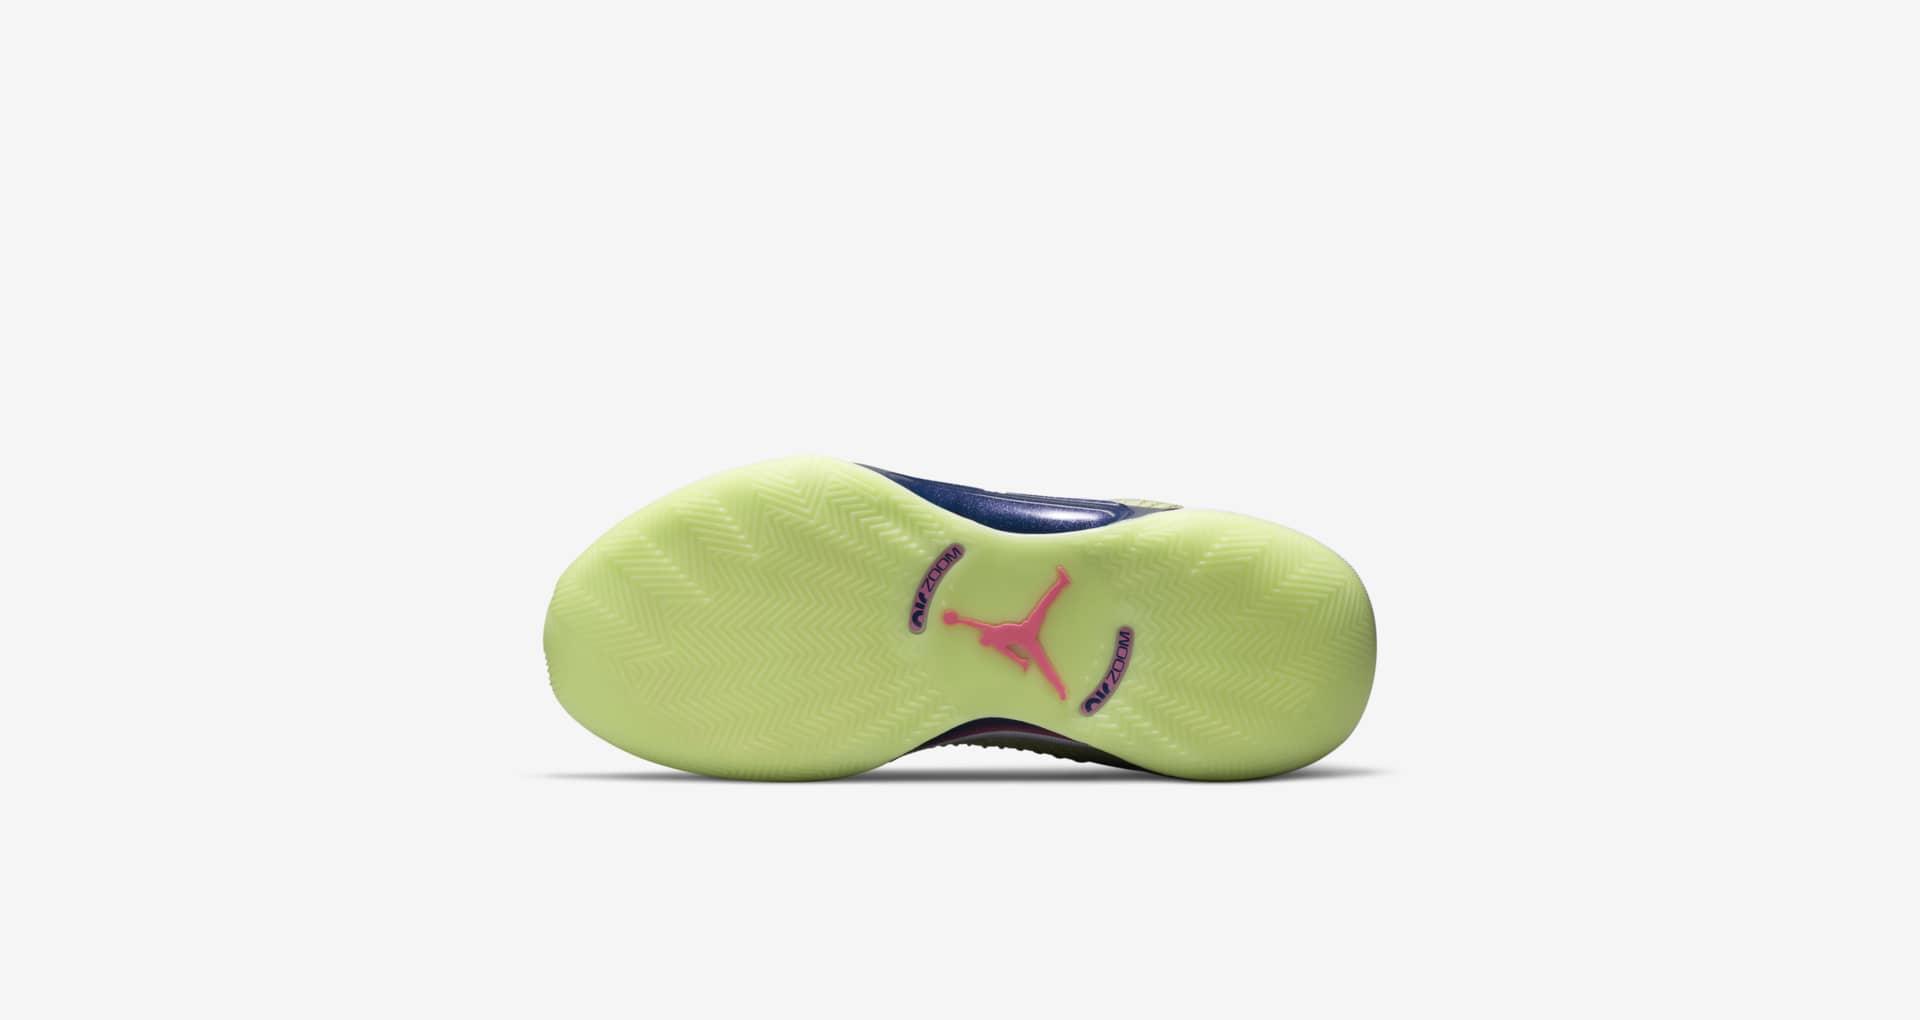 Luka,AJ35 Low,Air Jordan  东契奇专属配色!全新 Air Jordan 35 发售日期确定!